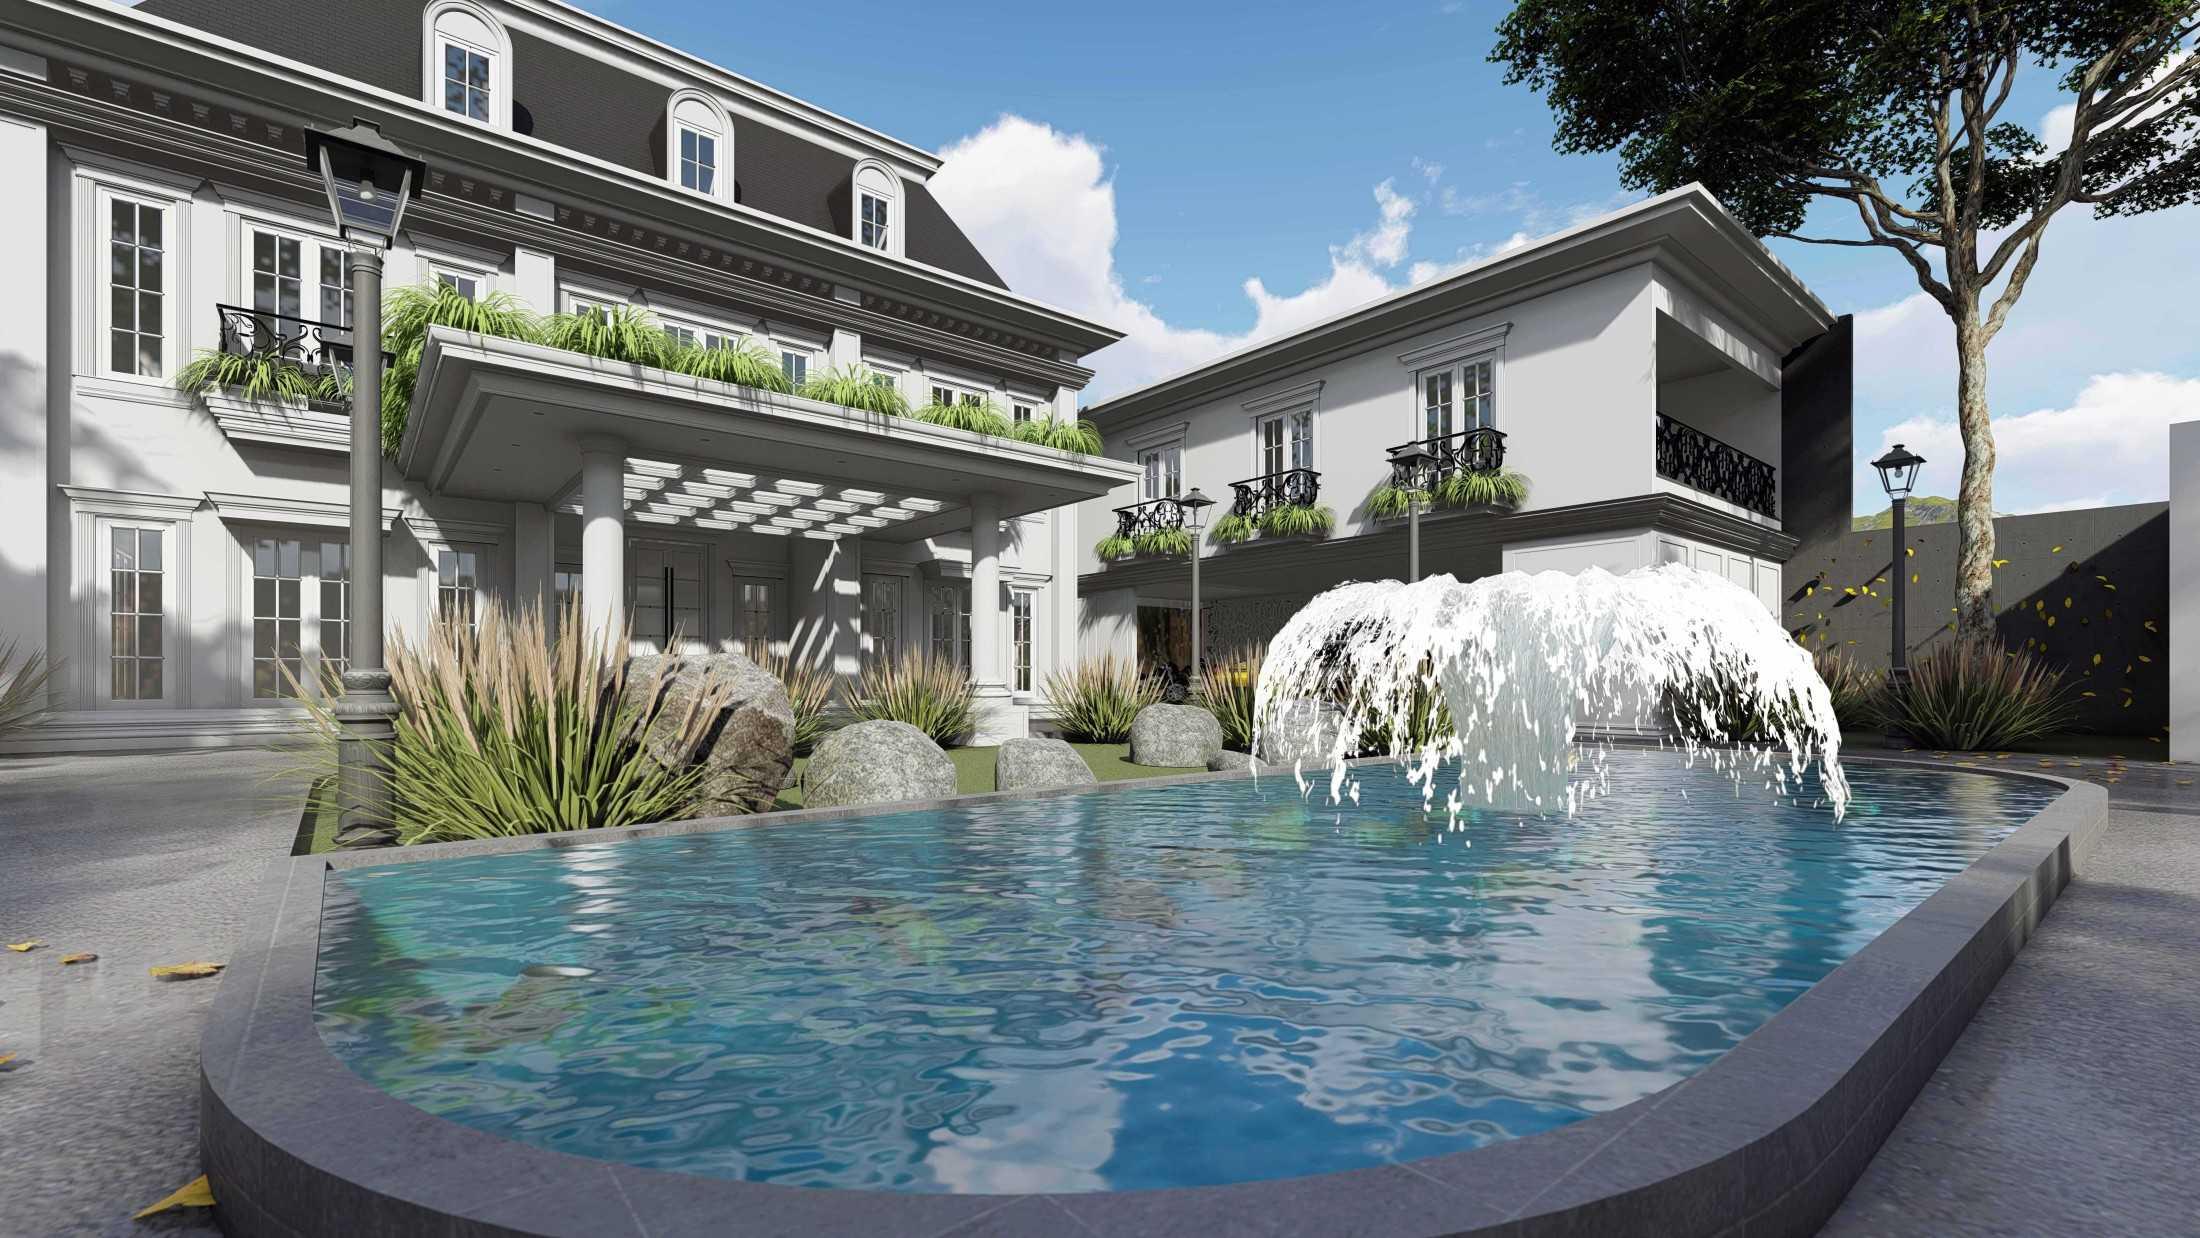 Mahastudio & Partner Hidden Palace House Bogor, Jawa Barat, Indonesia Bogor, Jawa Barat, Indonesia Mahastudio-Partner-Hidden-Palace-House Klasik 55937